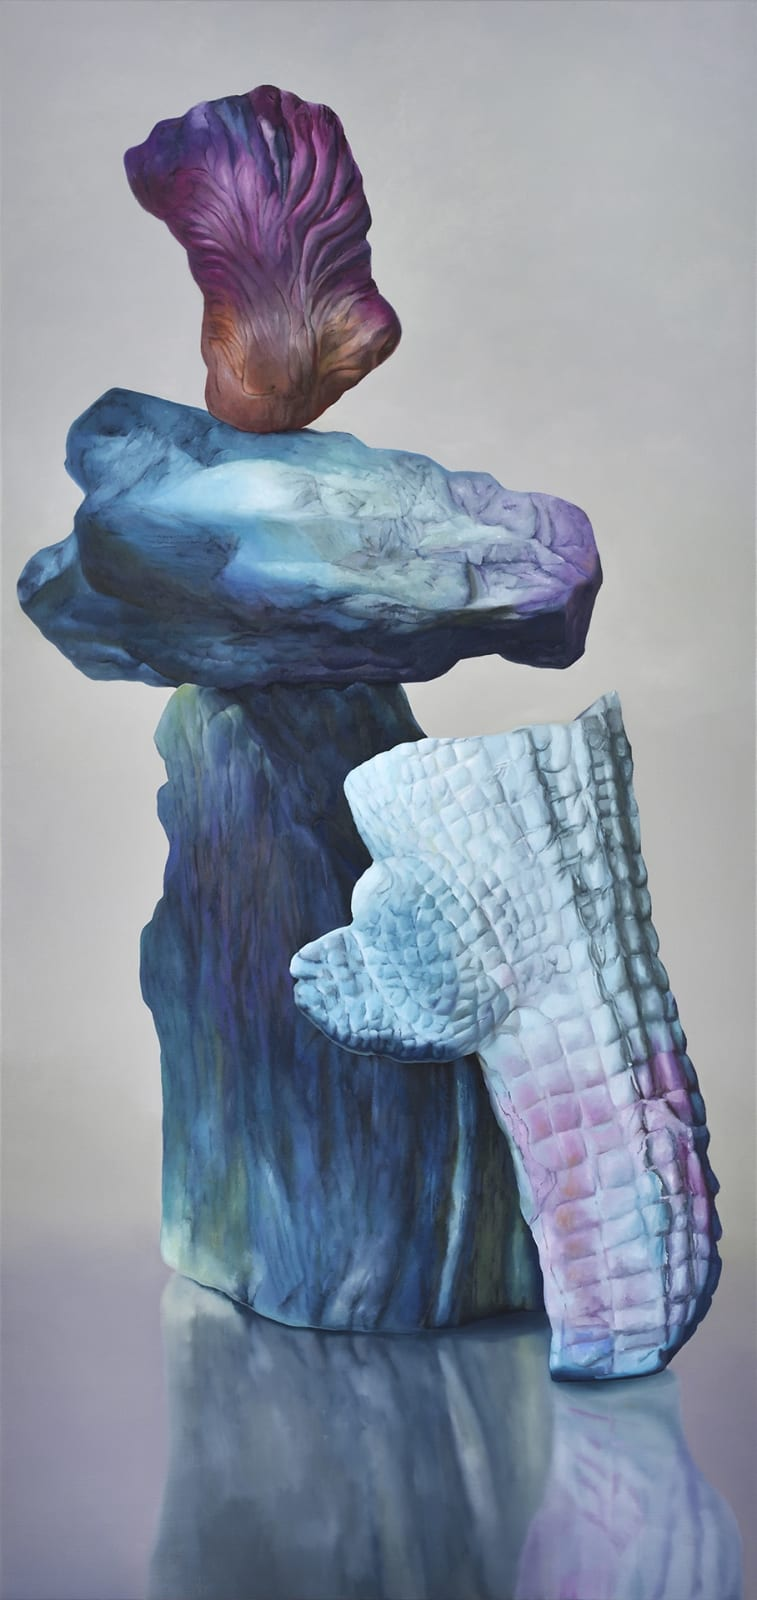 Maude Maris, Dandy, 2019, Oil On Canvas, 190X90cm.